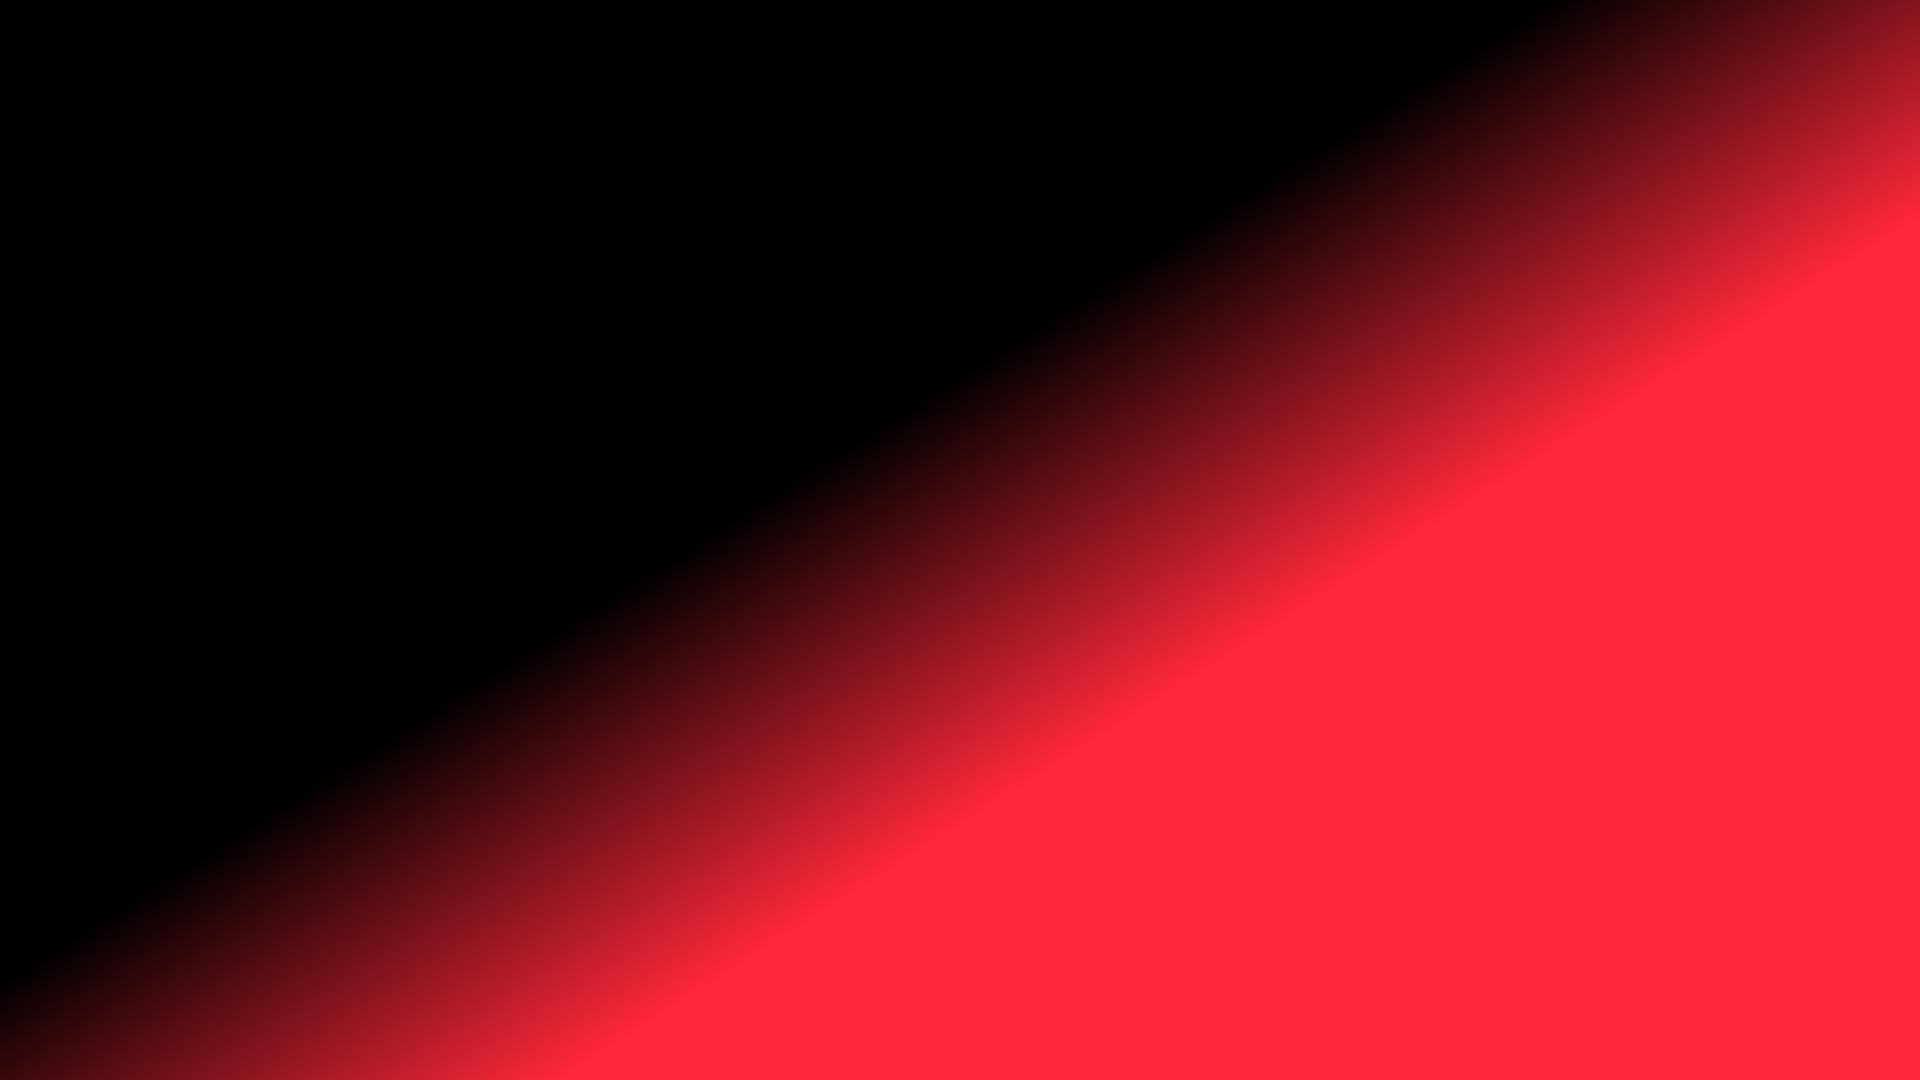 Desktop Wallpaper Background Black Pink Peach Gradient Full Hd Iphone Wallpaper Black Pin Red And Black Wallpaper Black Wallpaper Iphone Red Colour Wallpaper